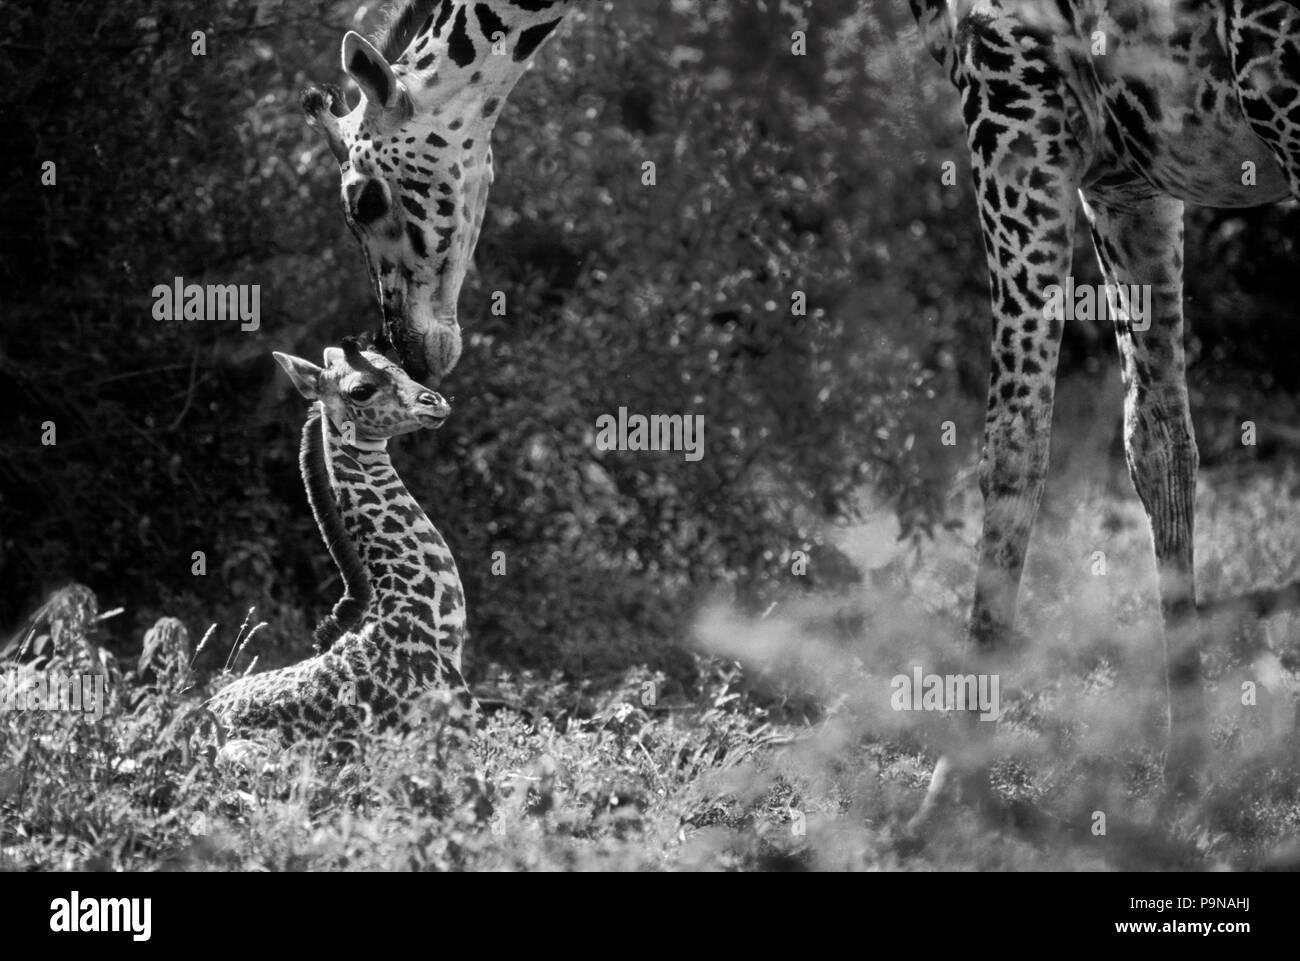 A newborn MAASAI GIRAFFE (Giraffa Camelopardalis) is so young it has not yet stood up - TANZANIA, LAKE MANYARA NATIONAL PARK - Stock Image